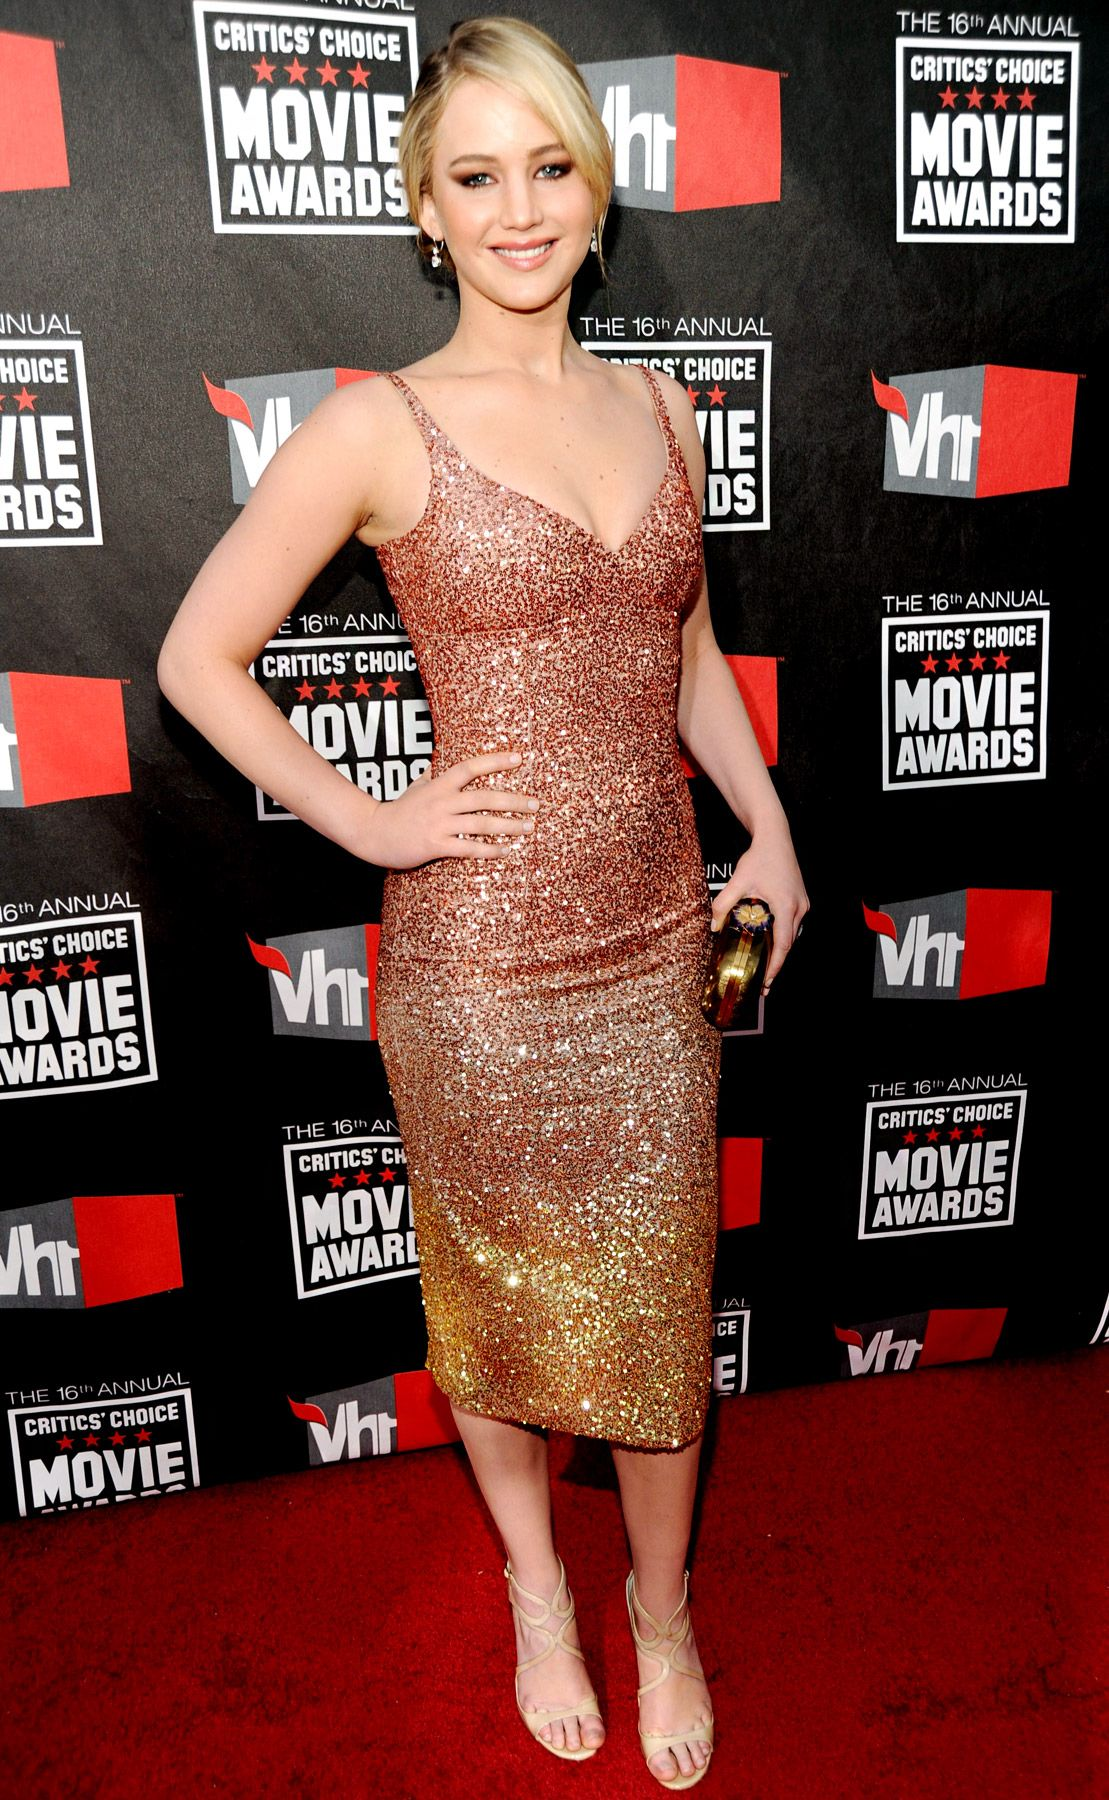 Jennifer lawrences best dresses pinterest jennifer lawrence jennifer lawrence at the 16th annual critics choice movie awards voltagebd Image collections